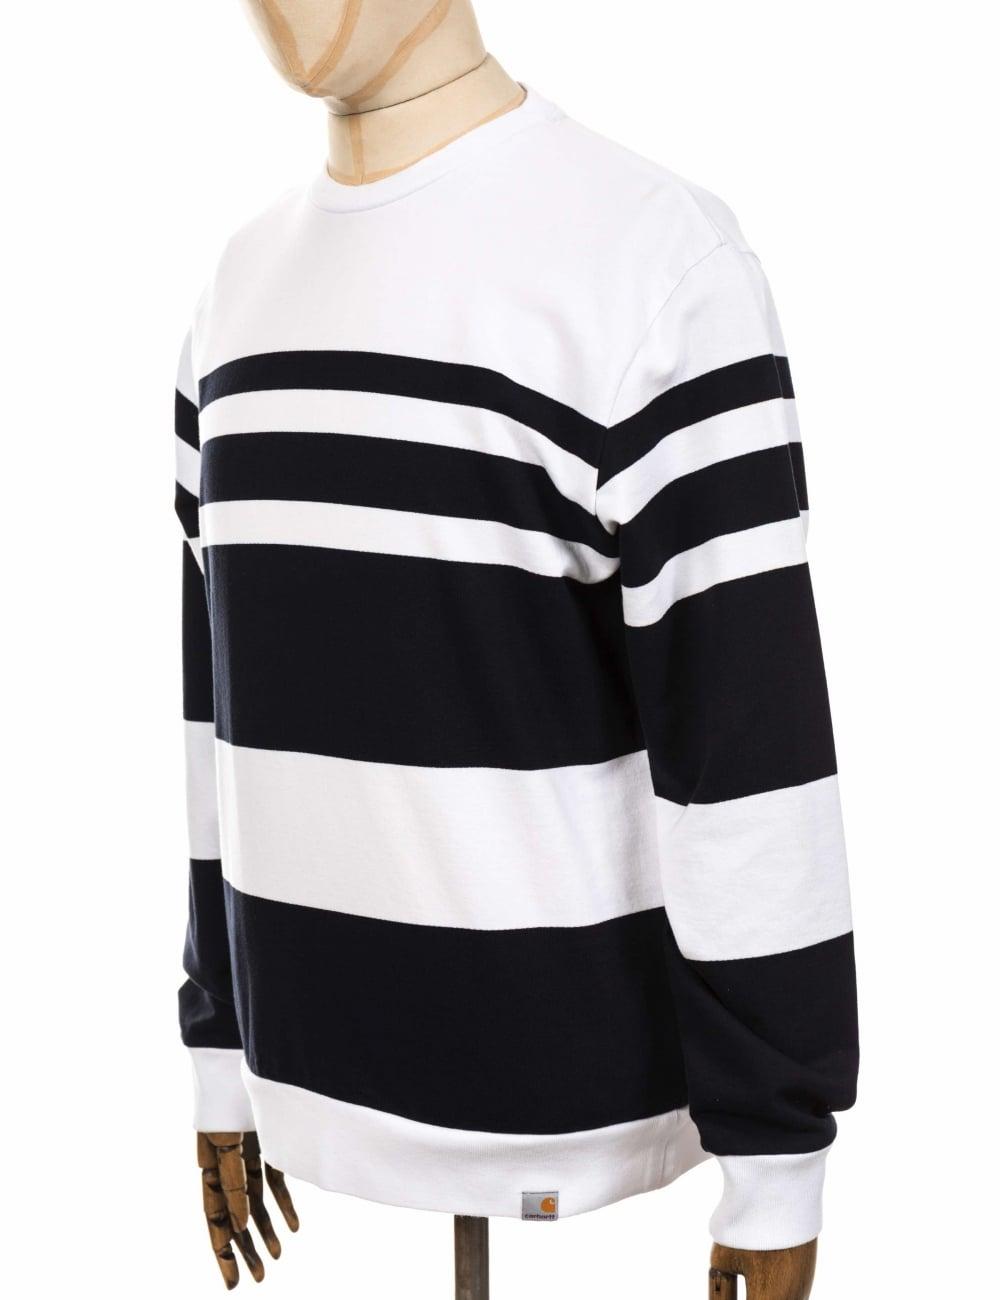 bd1b42a6ac2 Carhartt WIP Orlando Sweatshirt - White Dark Navy - Clothing from ...